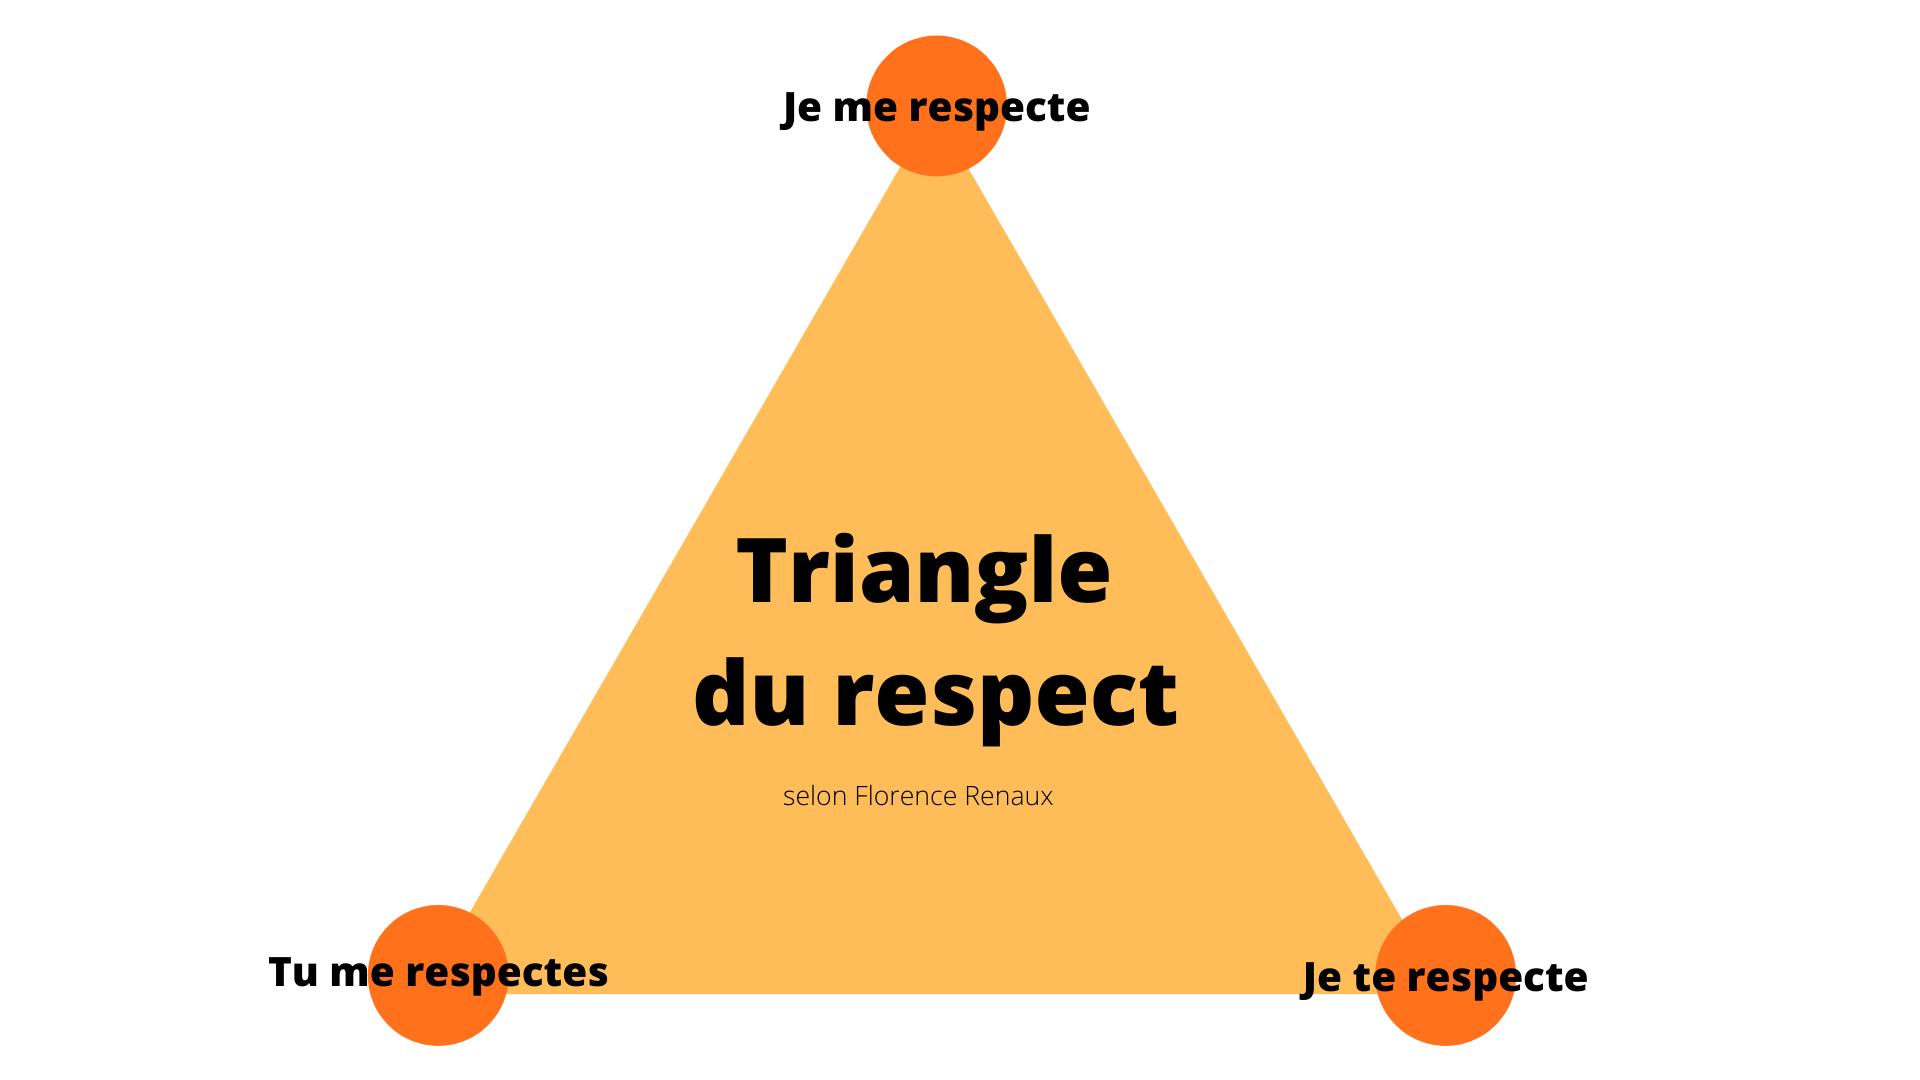 Triangle du respect